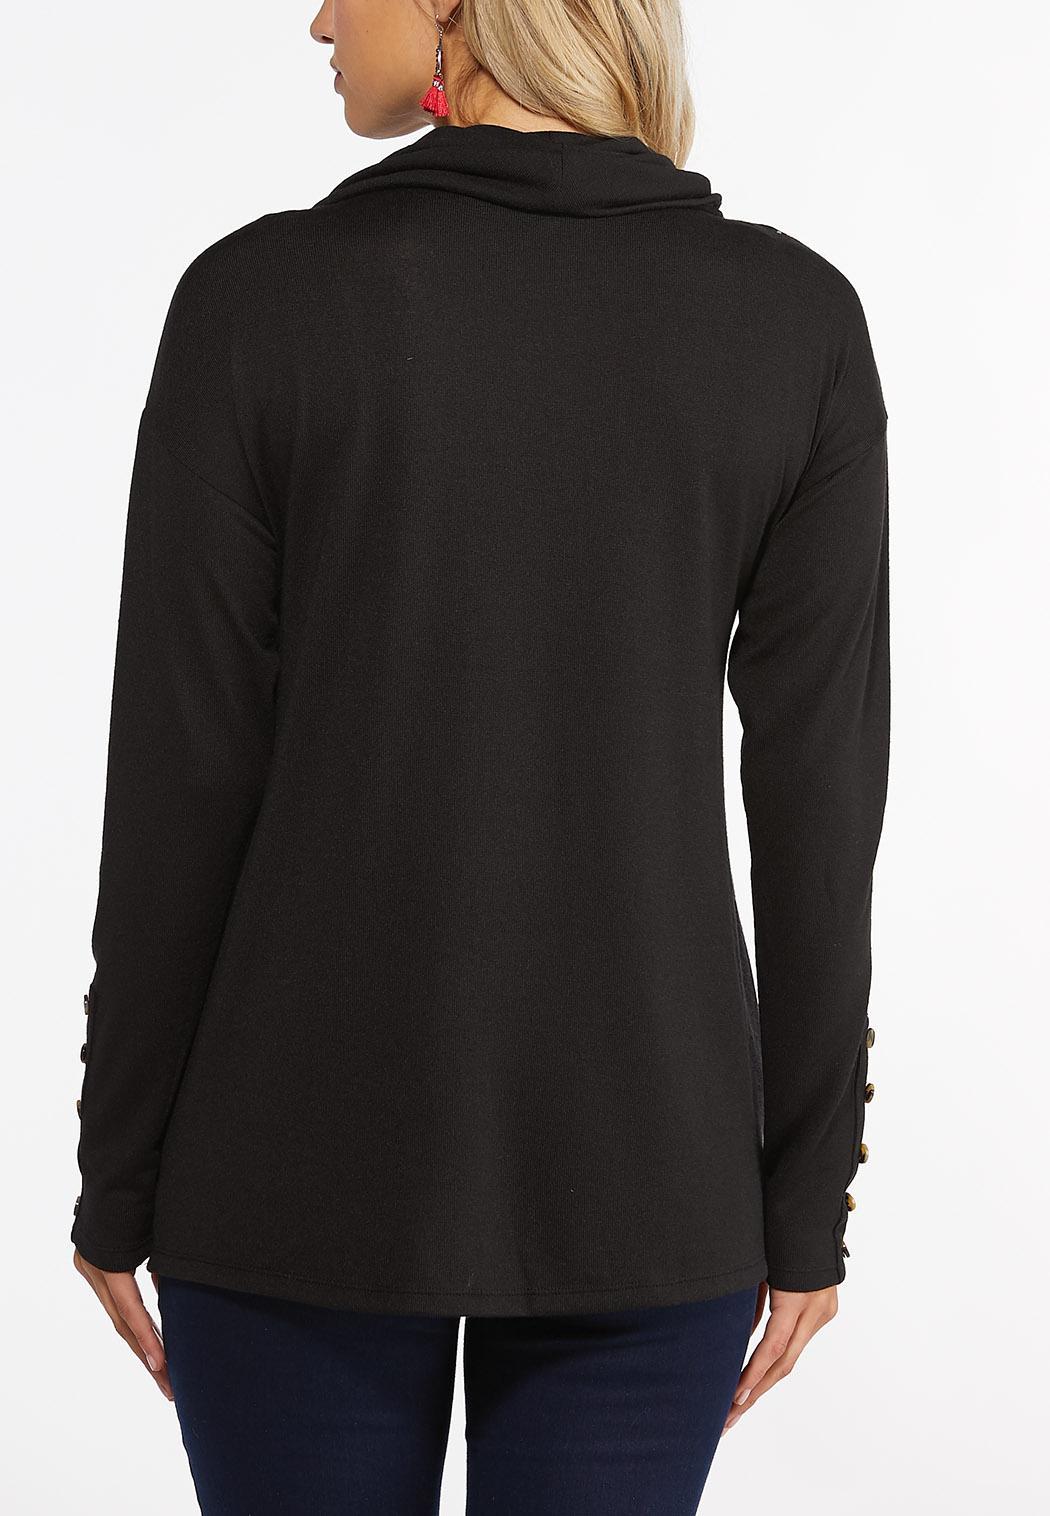 Paisley Cowl Neck Top (Item #44405479)